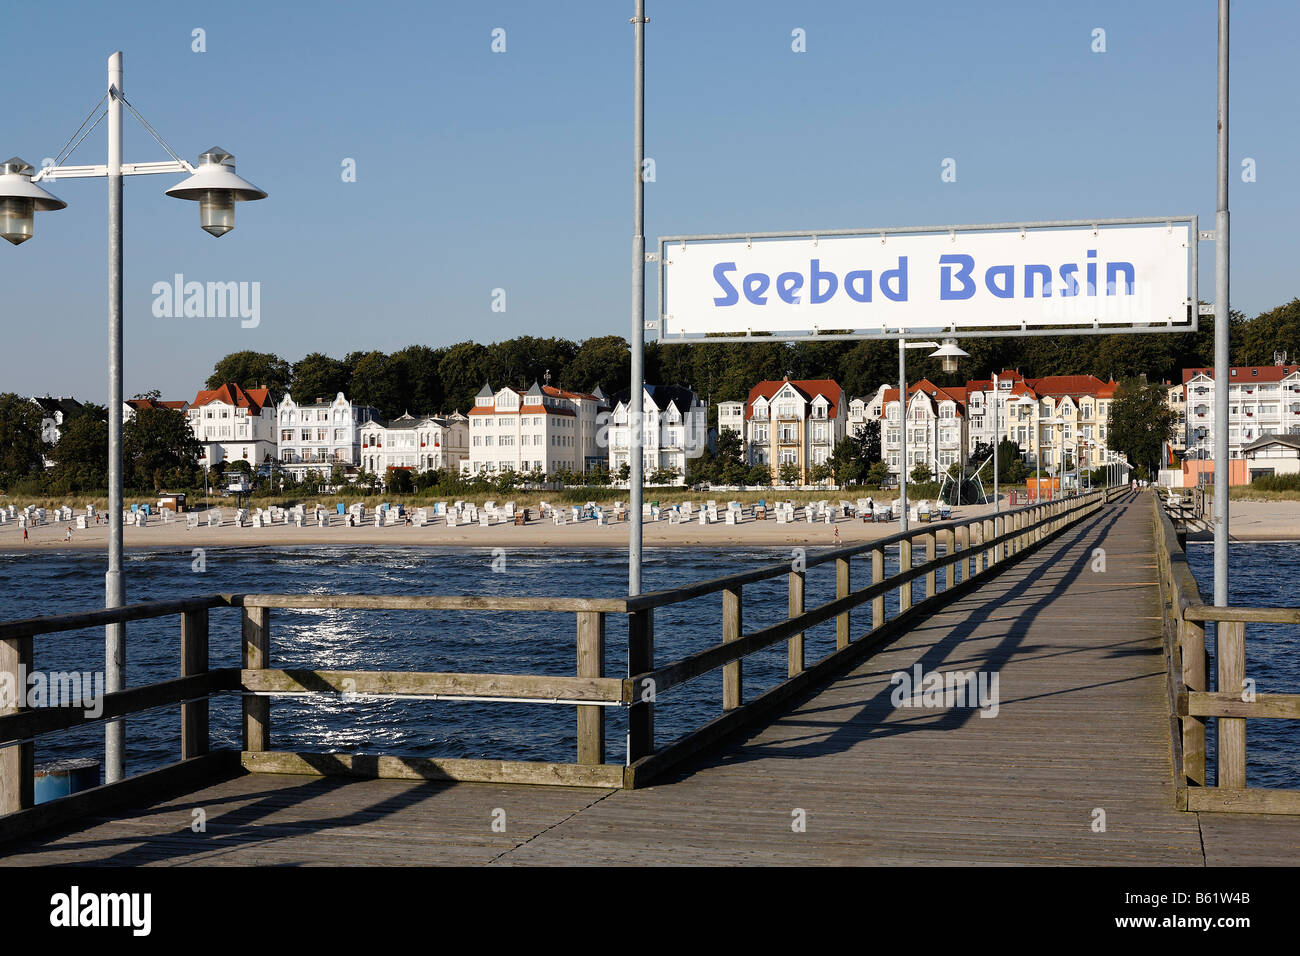 Bansin seaside resort, view from pier, Usedom Island, Baltic Sea, Mecklenburg-Western Pomerania, Germany, Europe Stock Photo